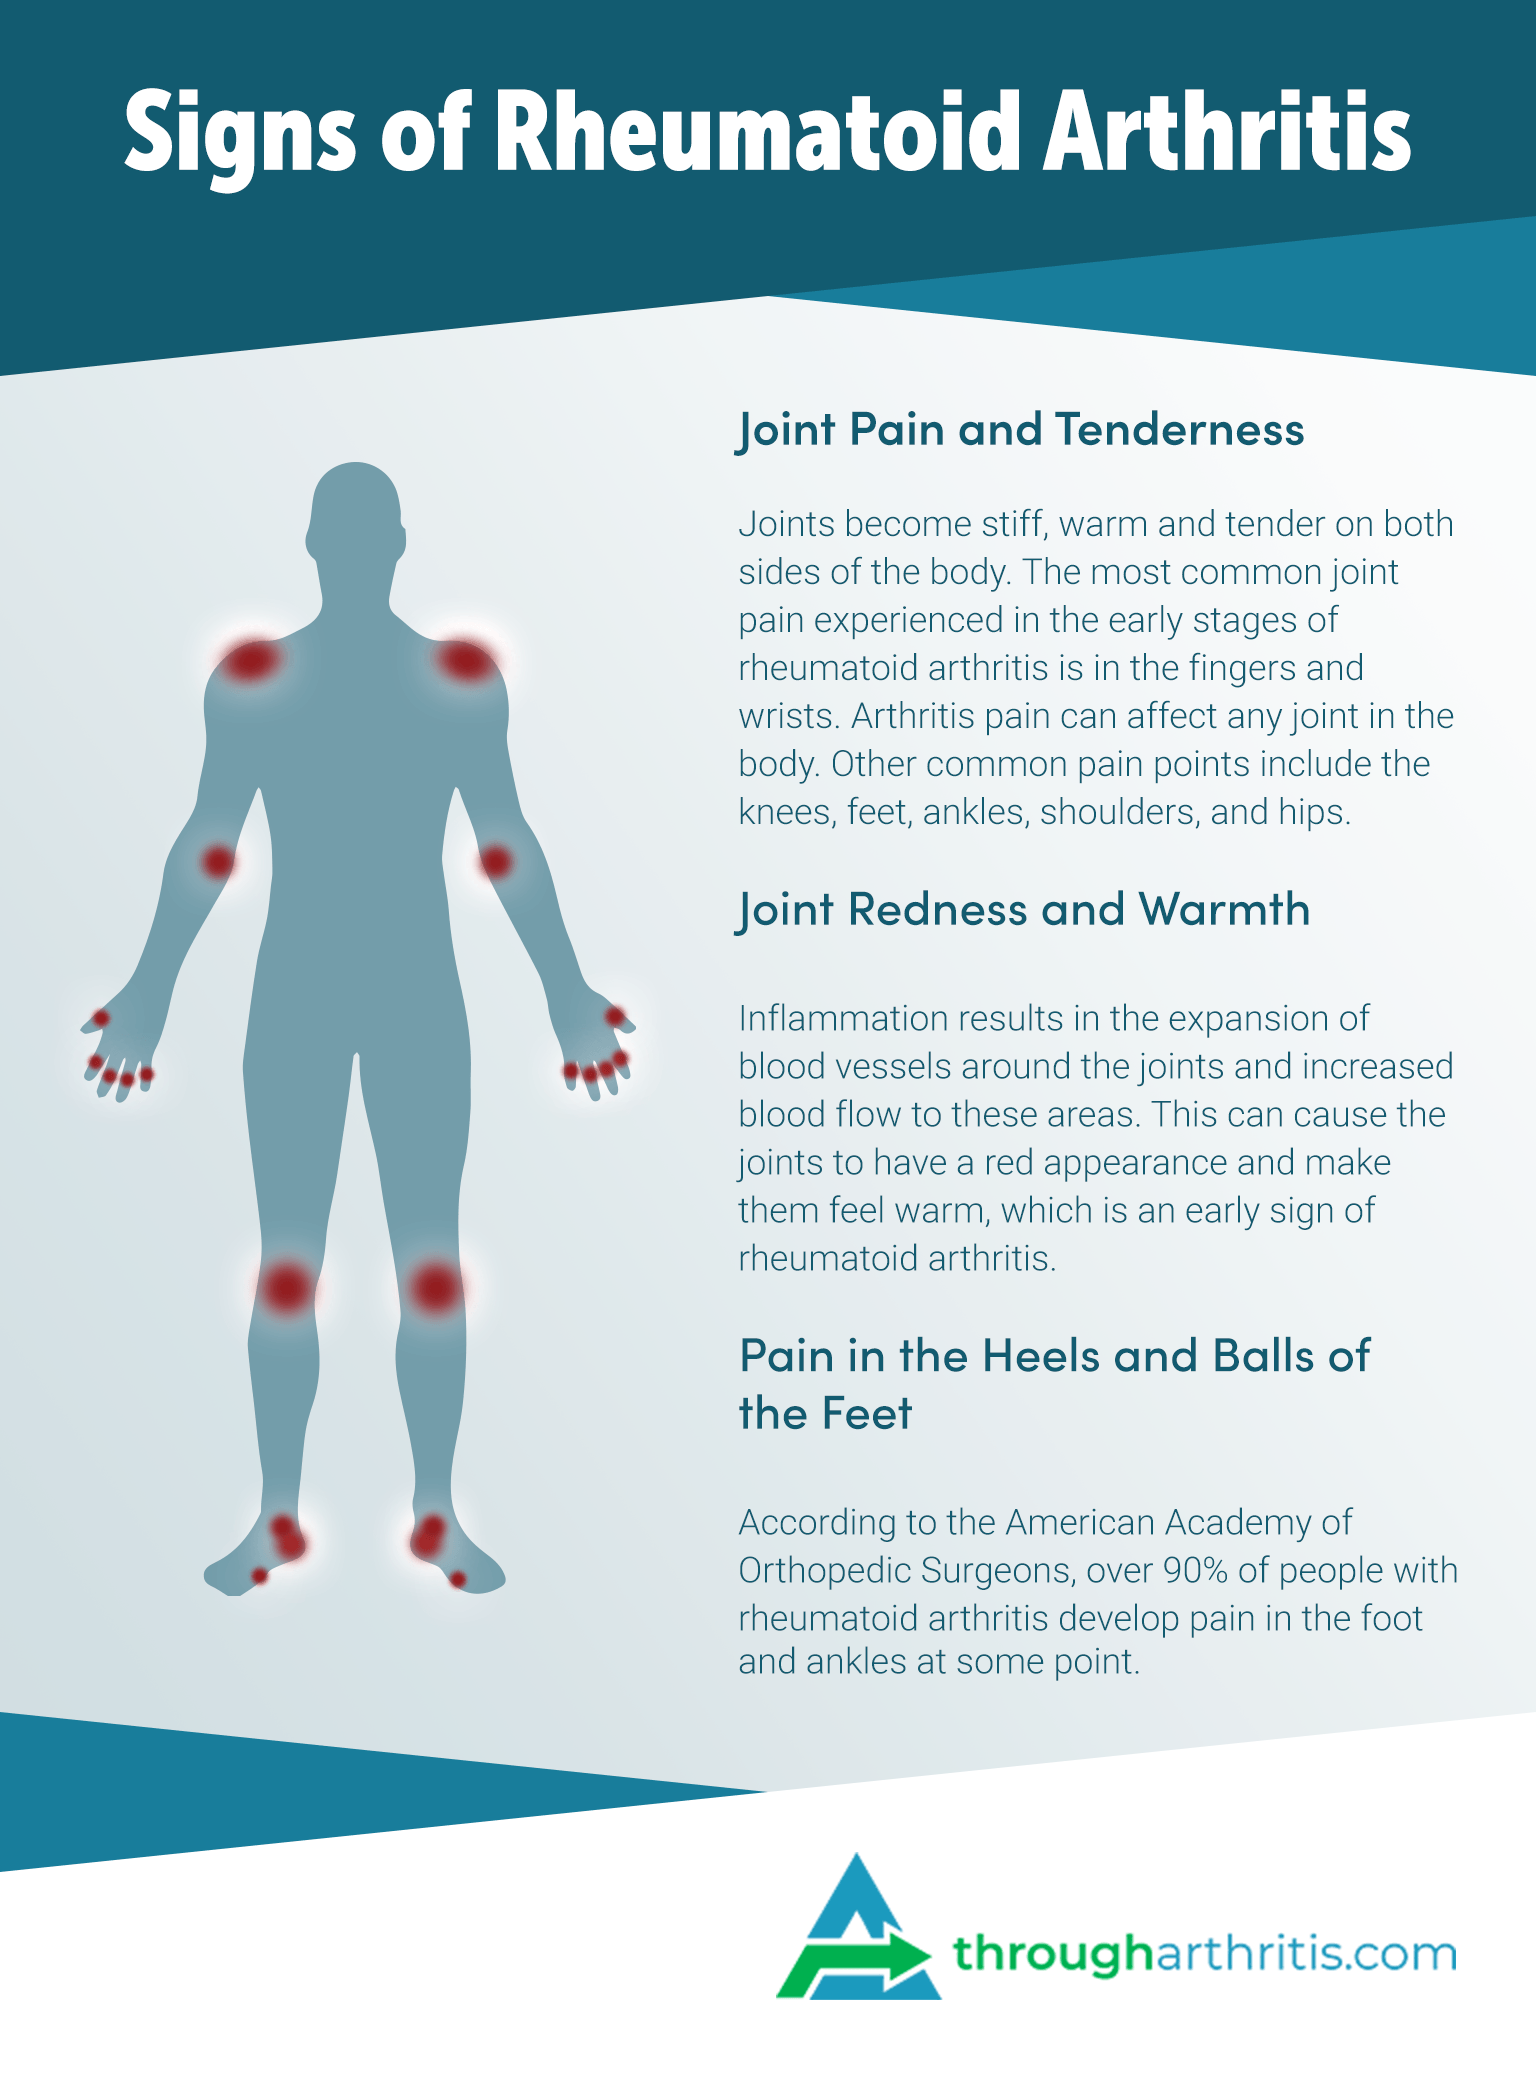 Rheumatoid Arthritis Symptoms Common Signs Of Rheumatoid Arthritis Through Arthritis Finding A Healthier Lifestyle Through Rheumatoid Arthritis